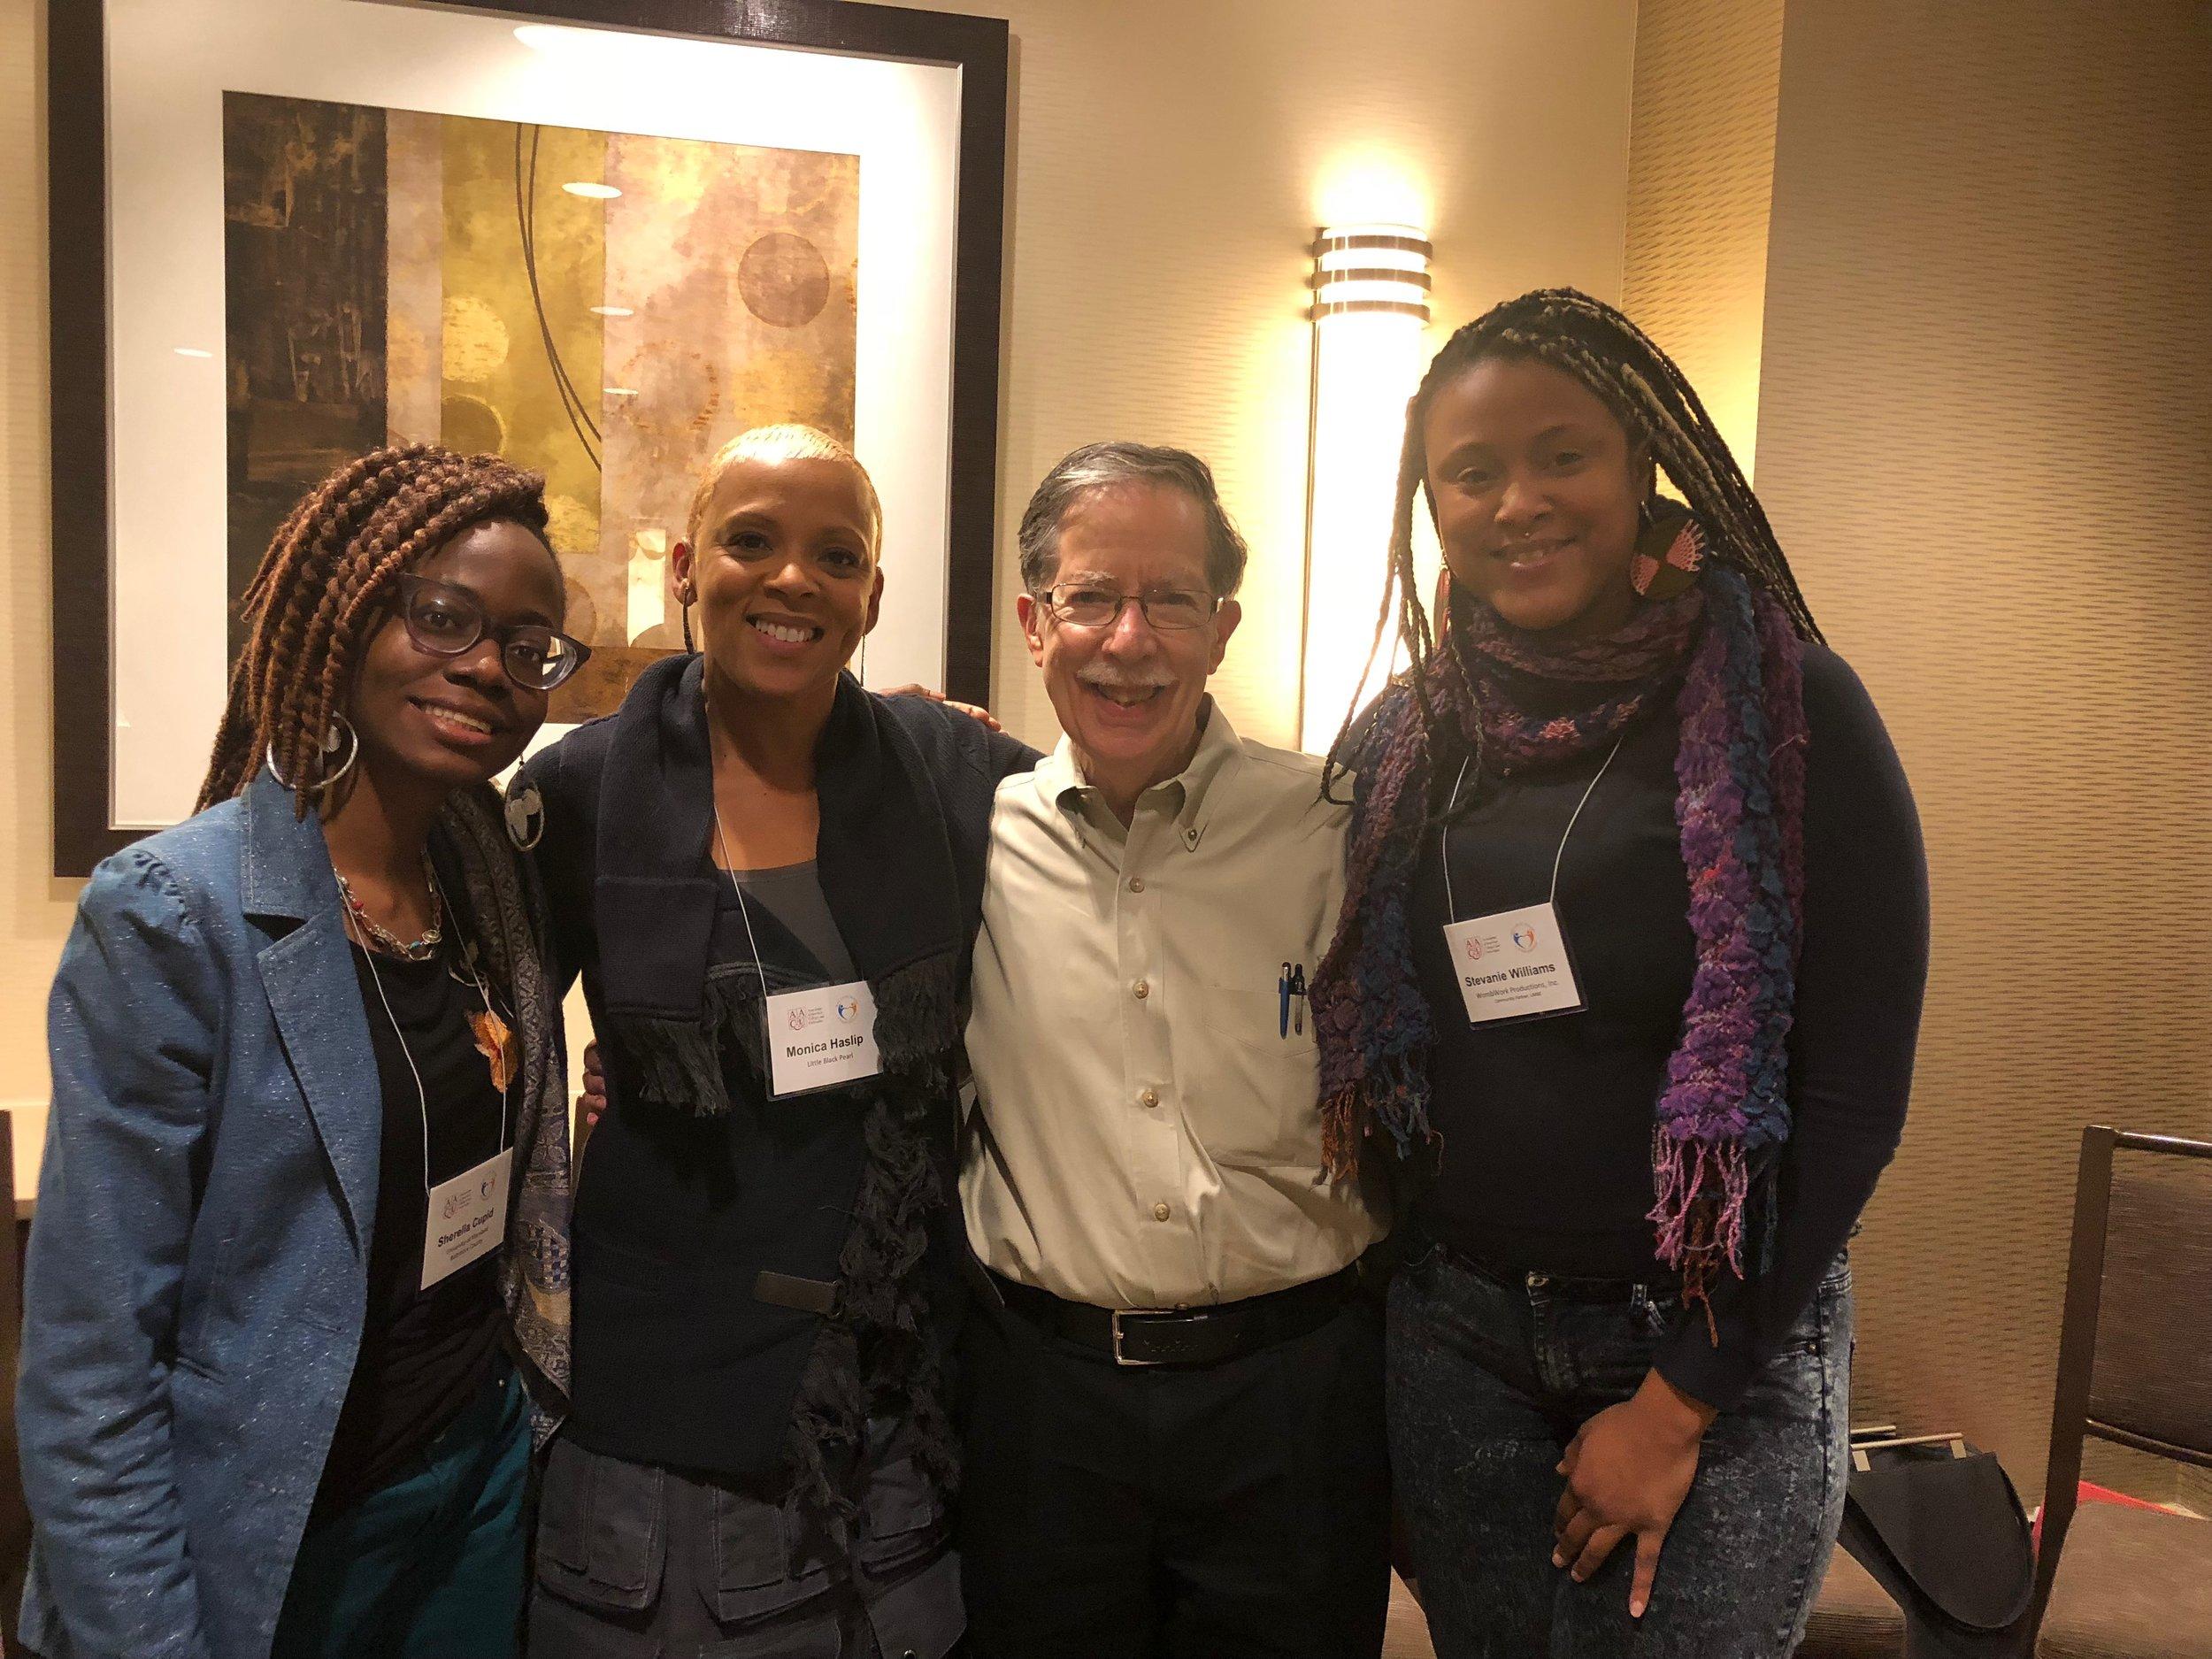 Sherella Cupid (UMBC), Facilitators: Monica Haslip, Founder/Executive Director,  Little Black Pearl  & Mike Wenger, Sr. Fellow AAC&U; Sr. Consultant on Race Relations, W.K. Kellogg Foundation, Stevanie Williams (WWP)